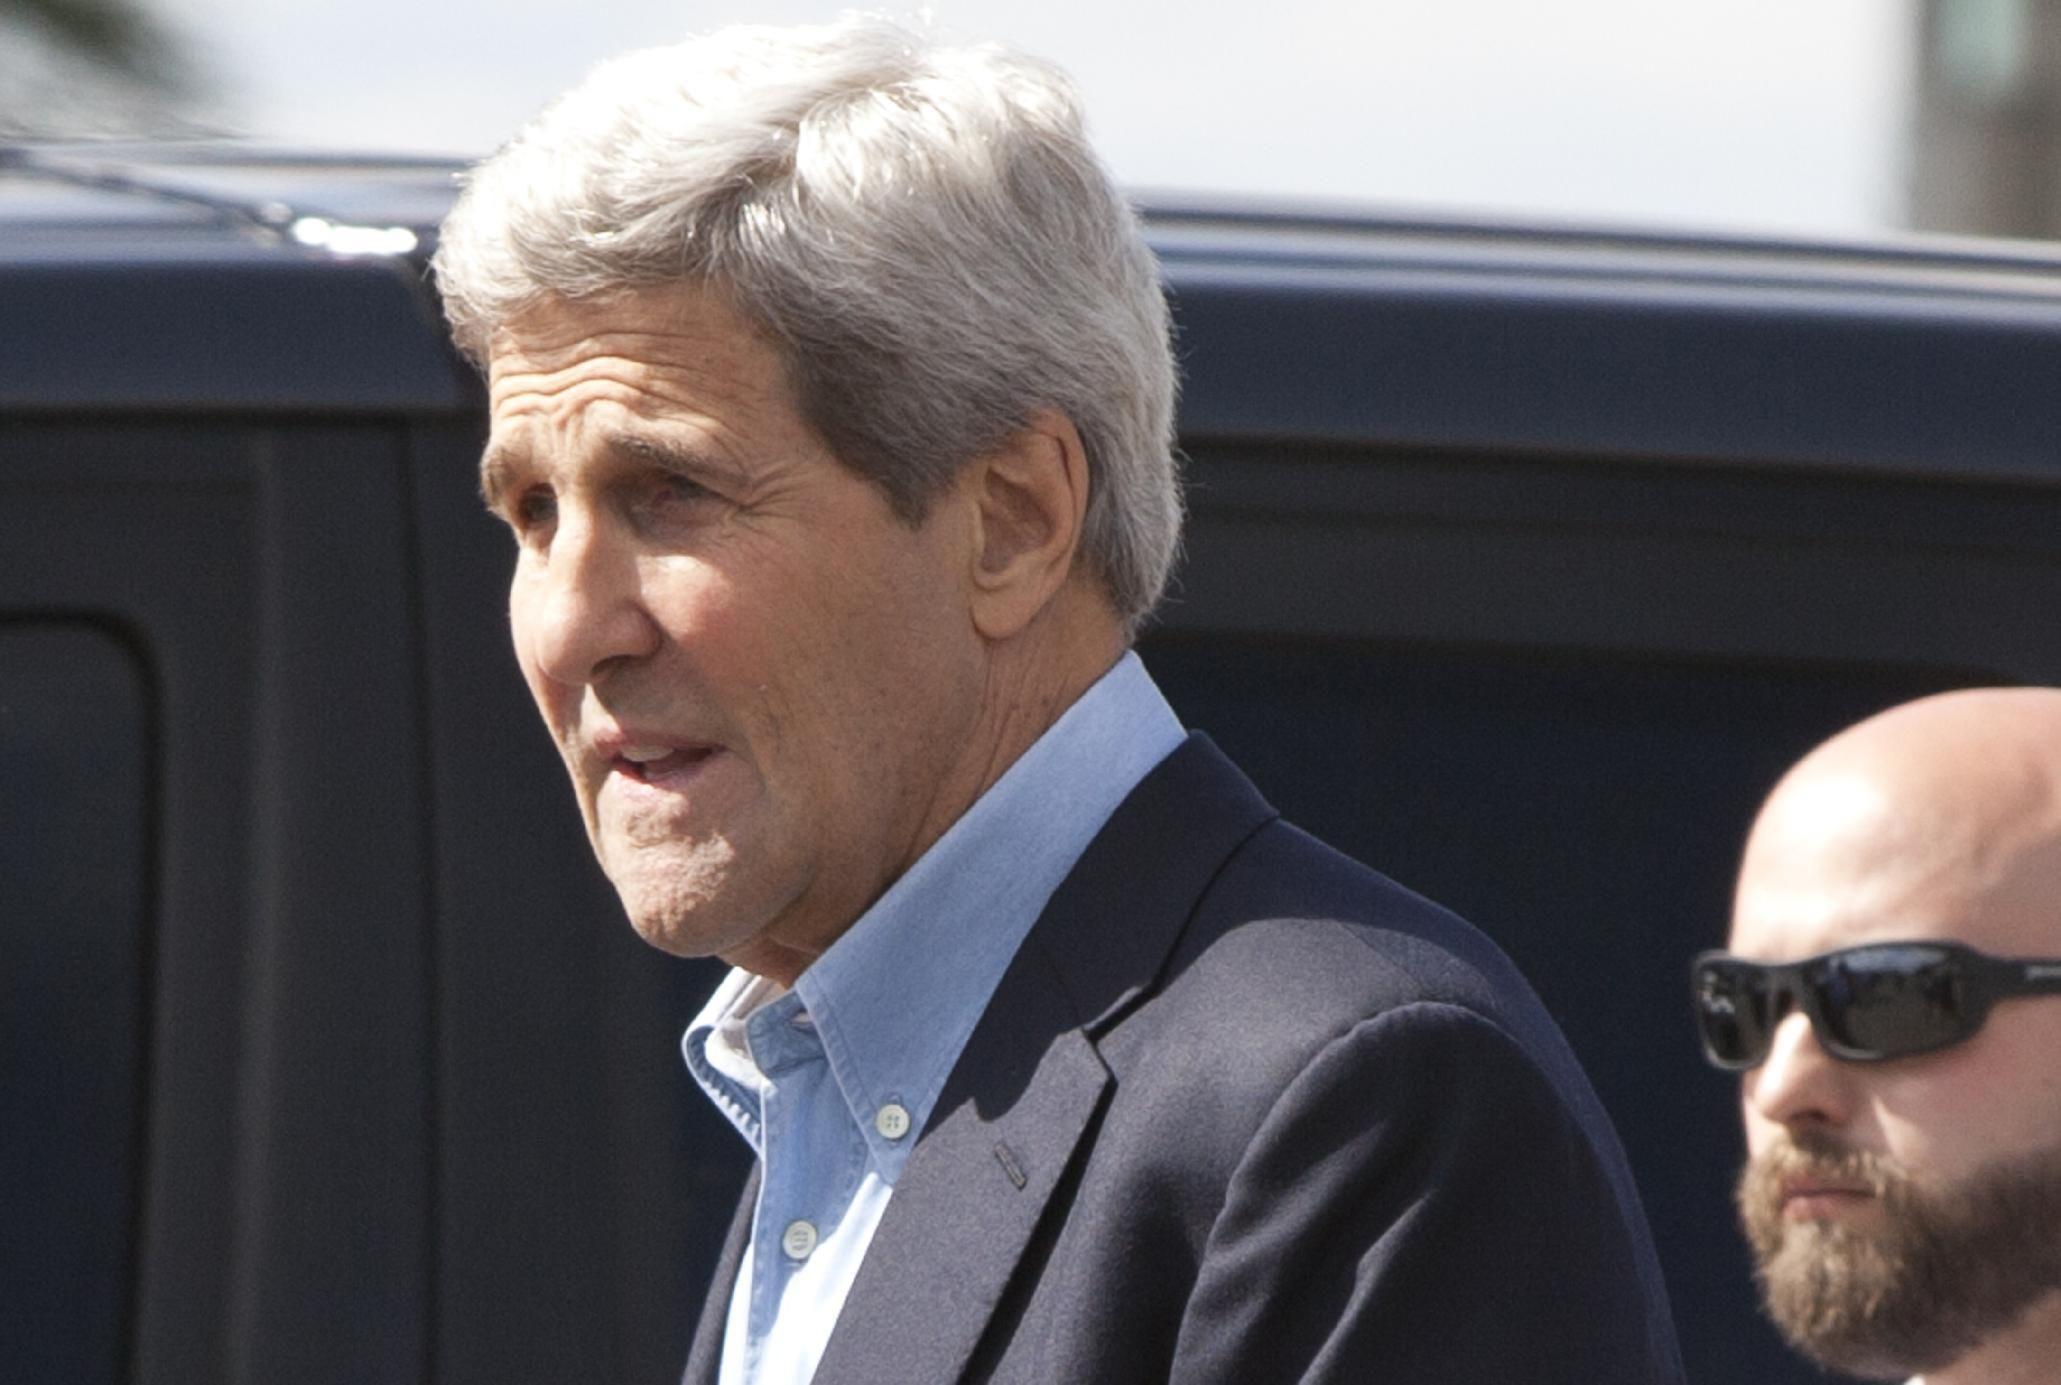 John Kerry tries to pacify Israeli worries over Iran deal John Kerry  #JohnKerry